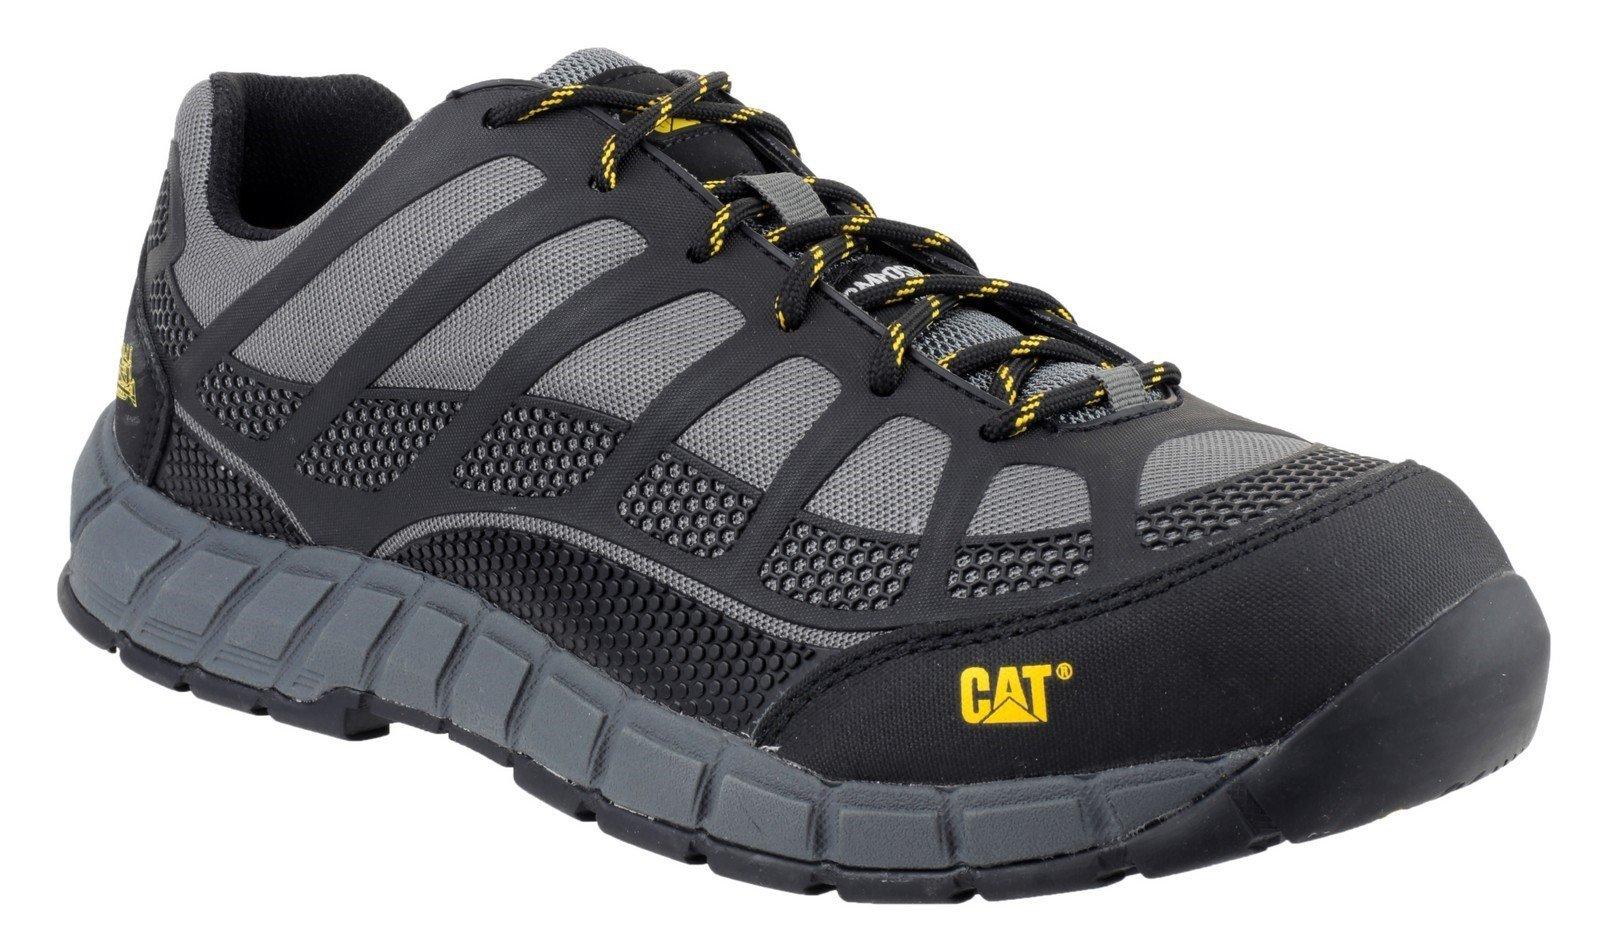 Caterpillar Men's Streamline Safety Shoe Charcoal 21128 - Charcoal 6